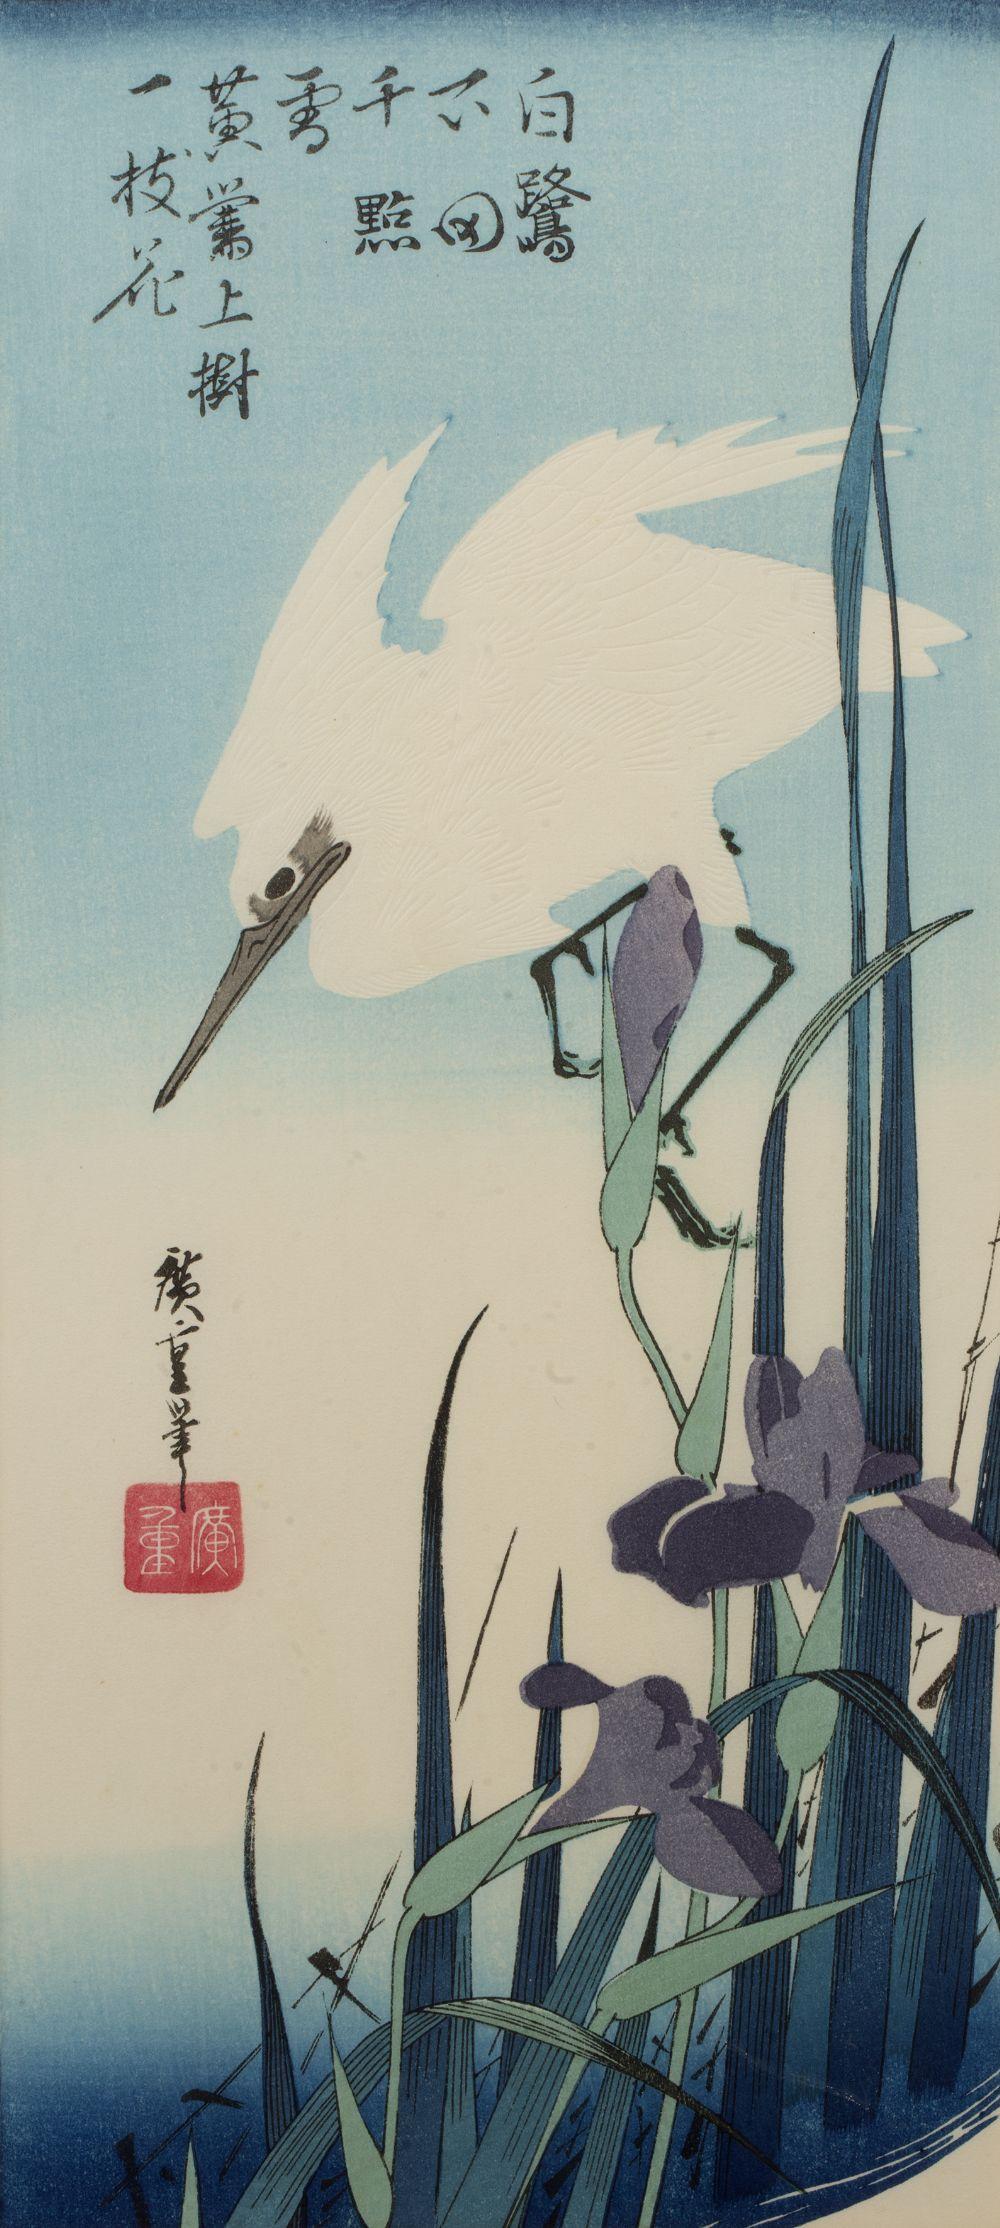 Ando/Utagawa Hiroshige (1797-1858) 'White heron and Iris' Japanese woodblock, 37.5cm x 17cm